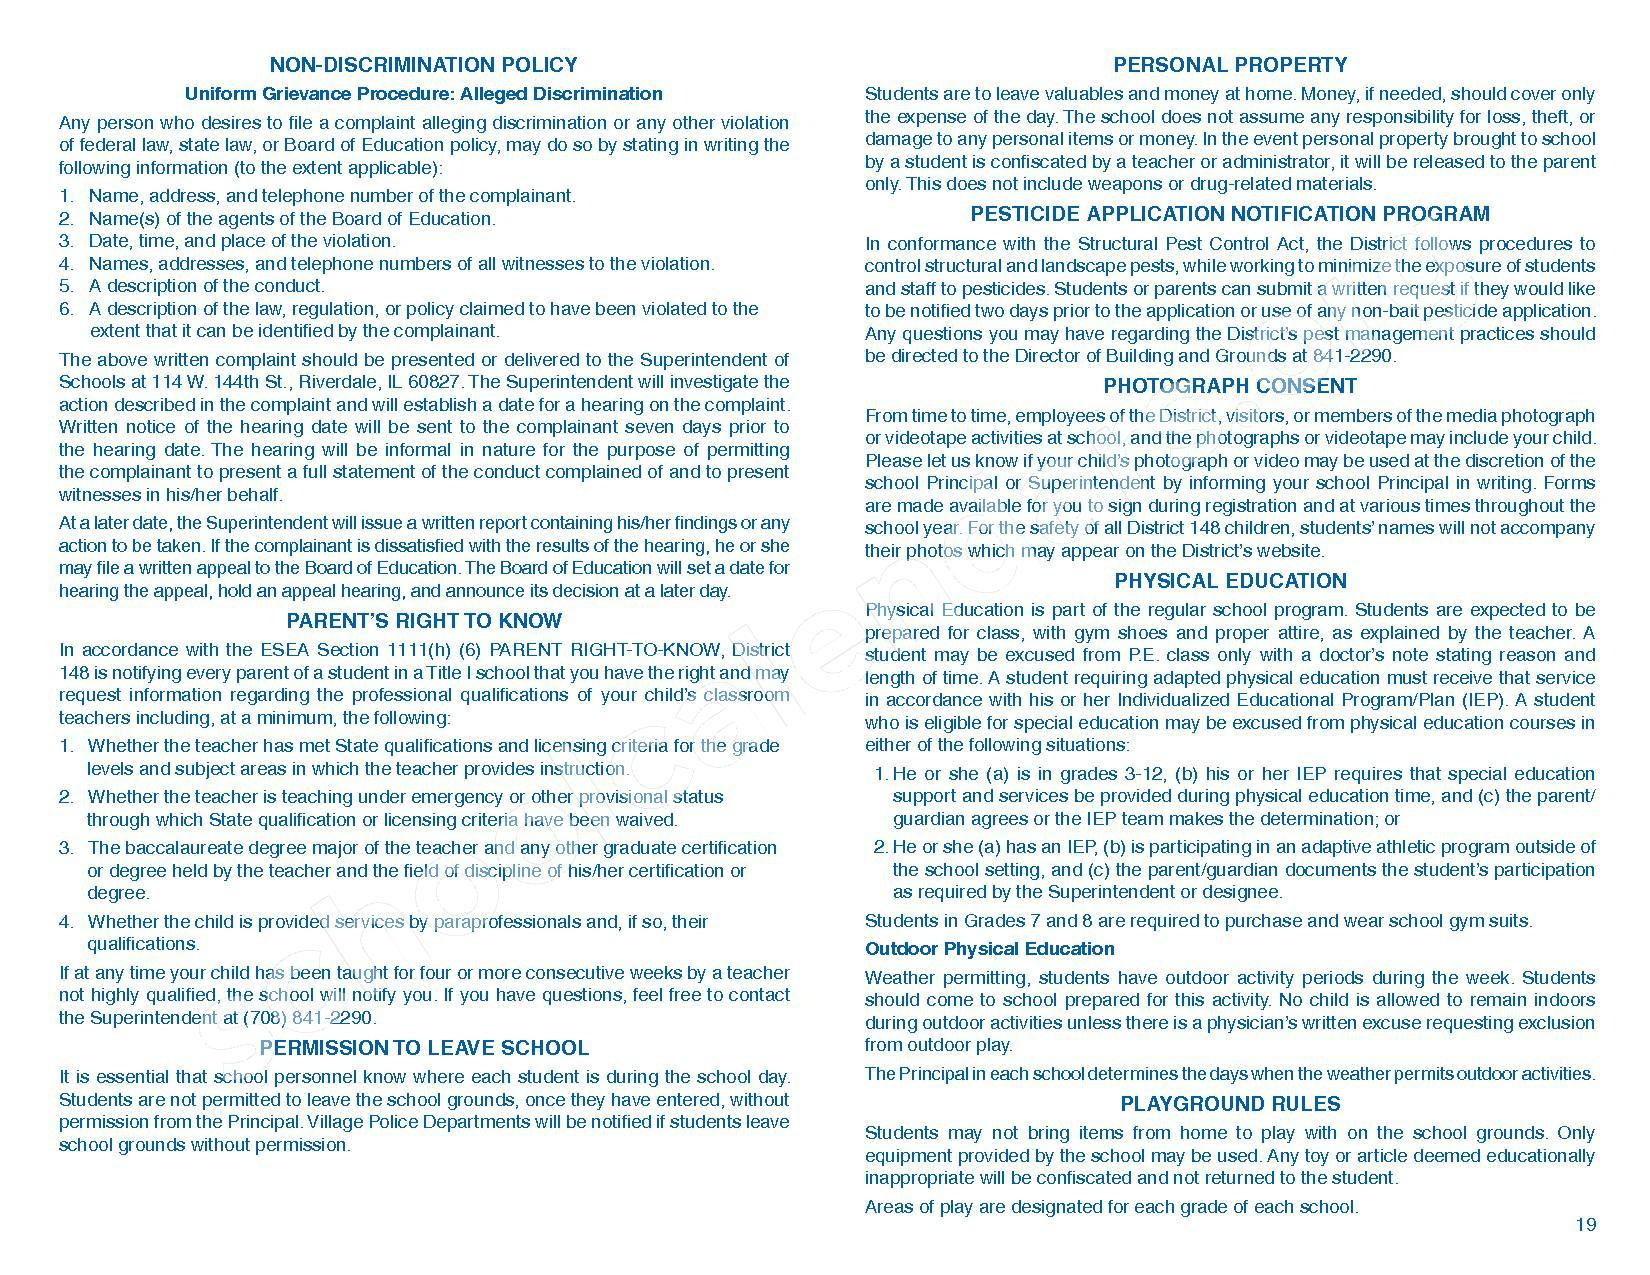 2016 - 2017 Parent/Student Handbook – Roosevelt Elementary School – page 23